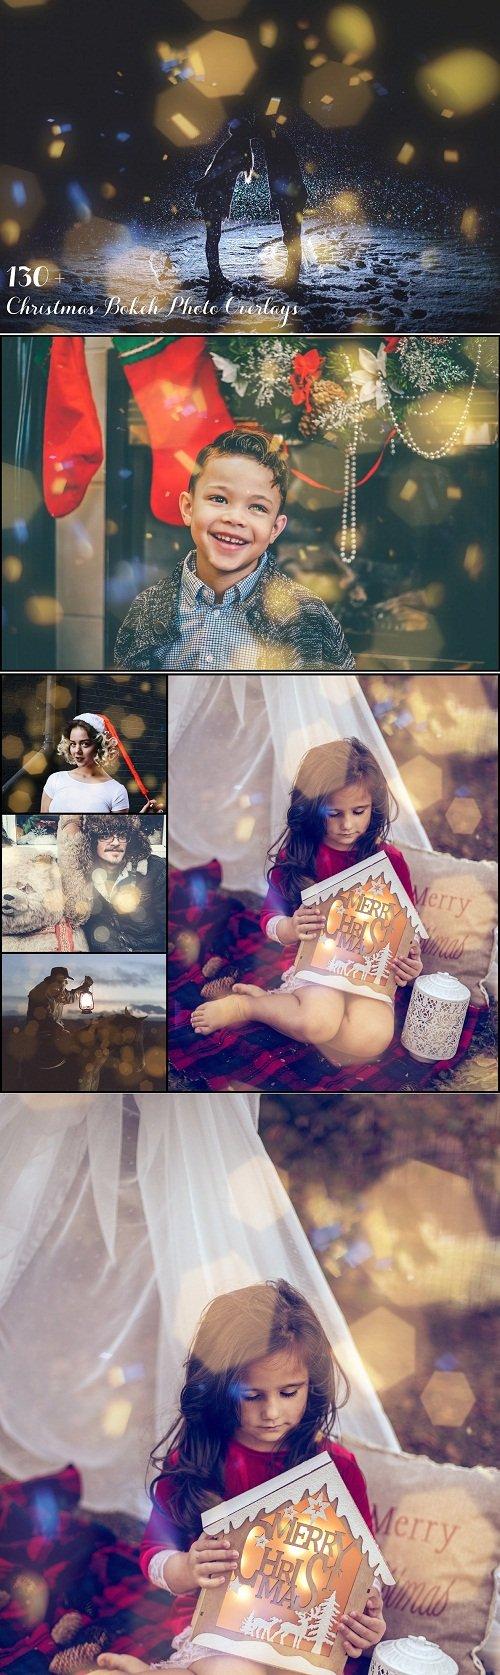 130+ Christmas Bokeh Photo Overlays 3196500